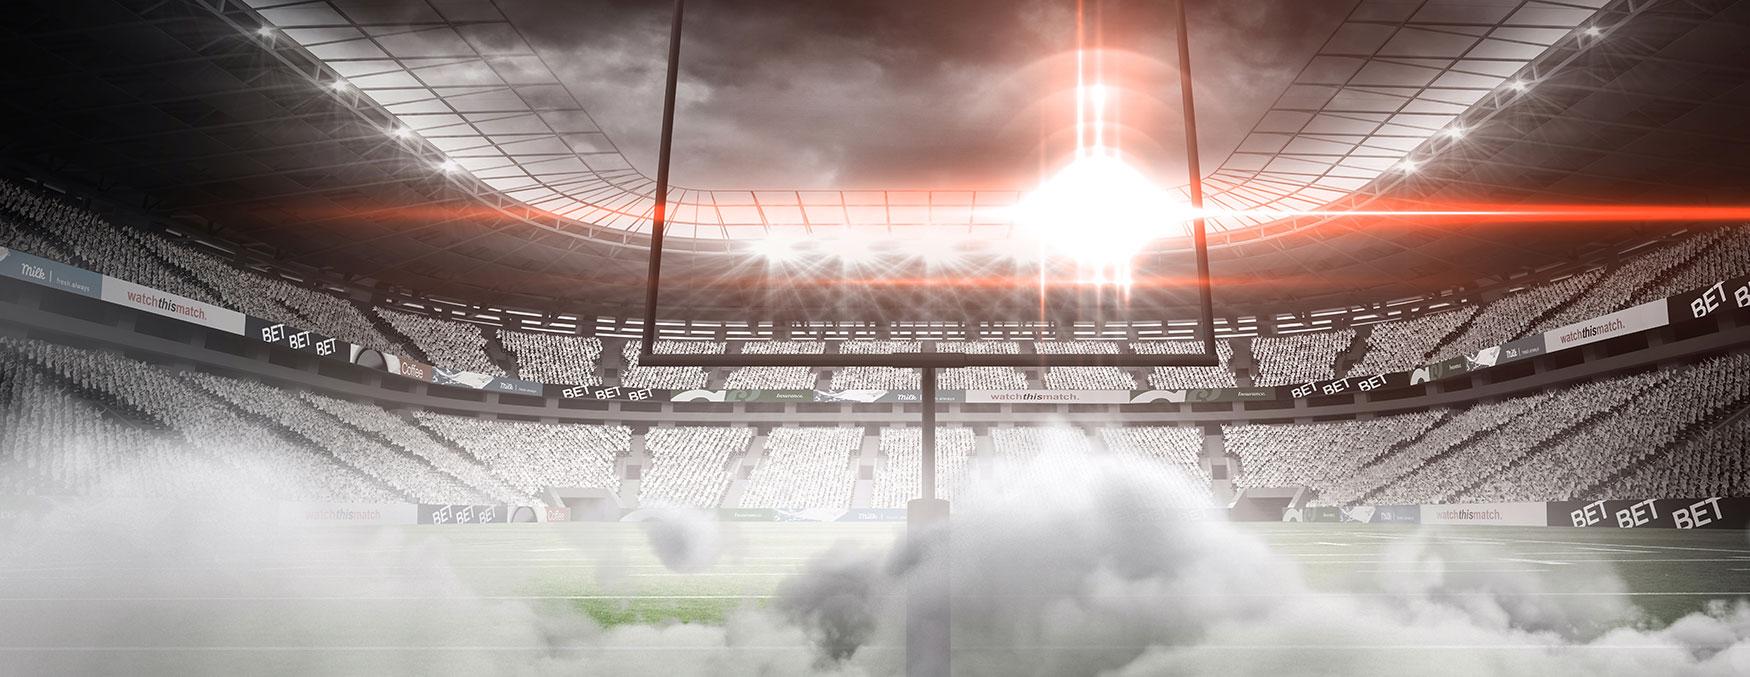 Is fantasy football betting legal